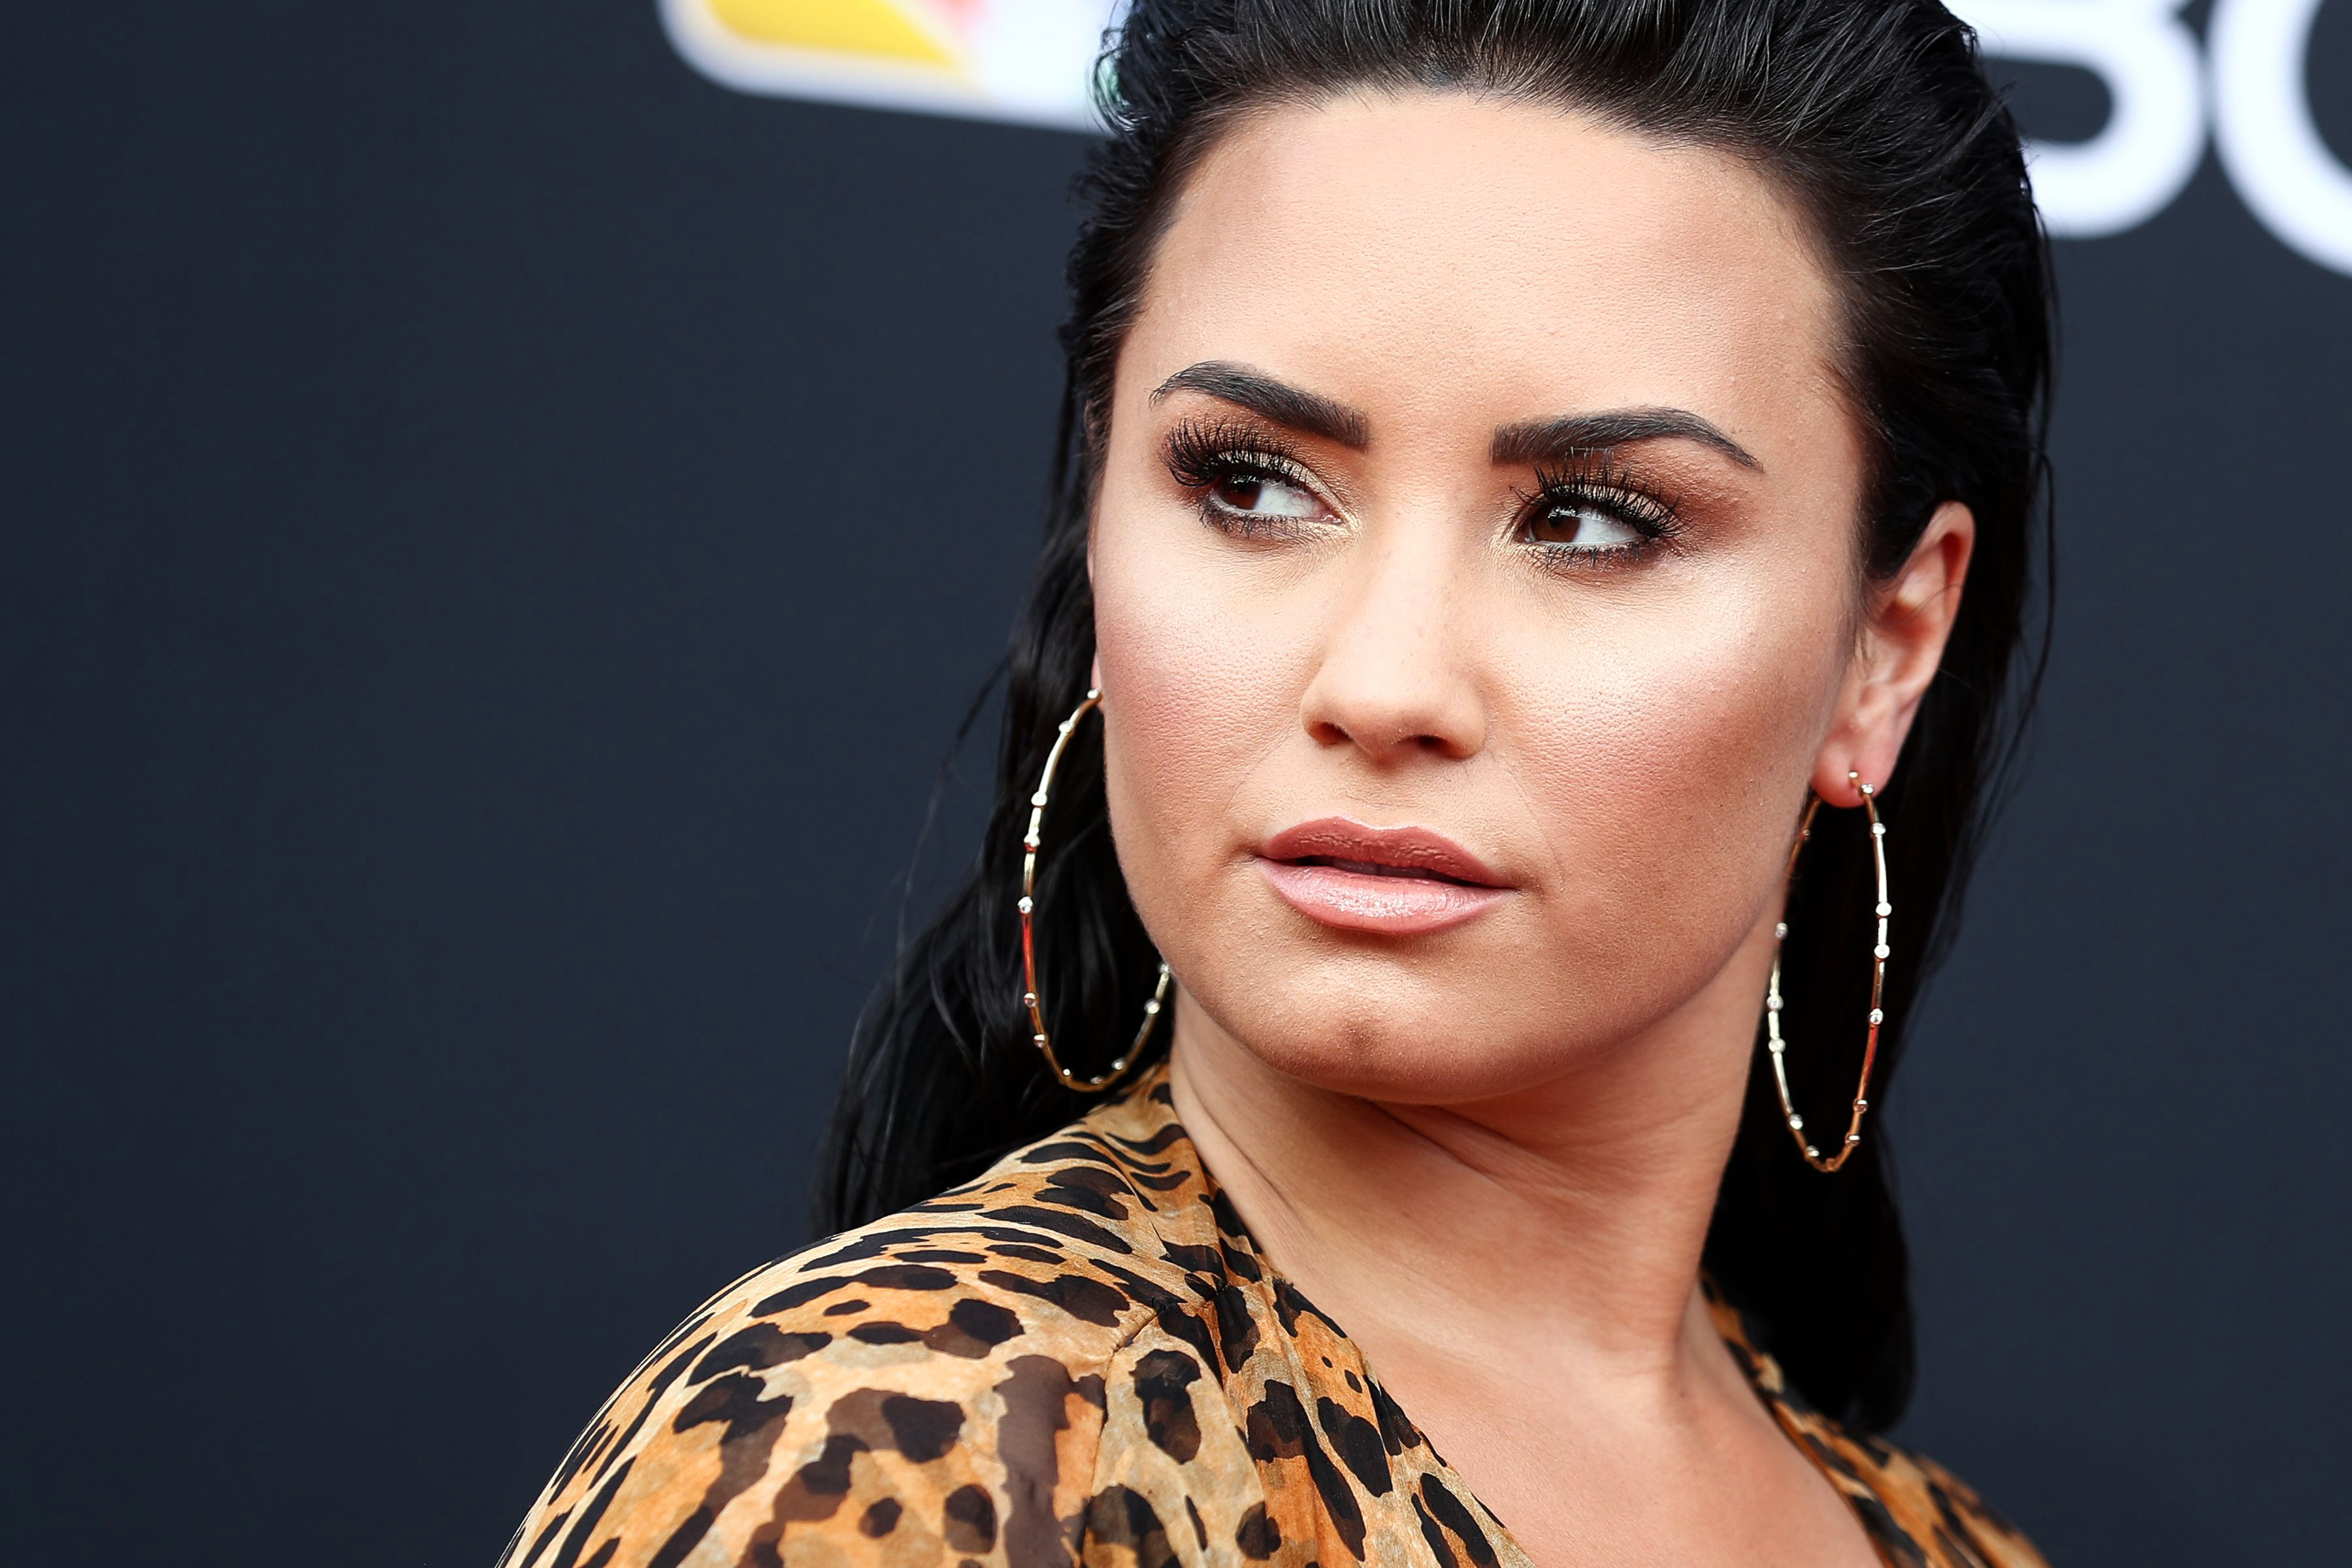 Photos Demi Lovato nudes (68 photo), Topless, Leaked, Boobs, in bikini 2018